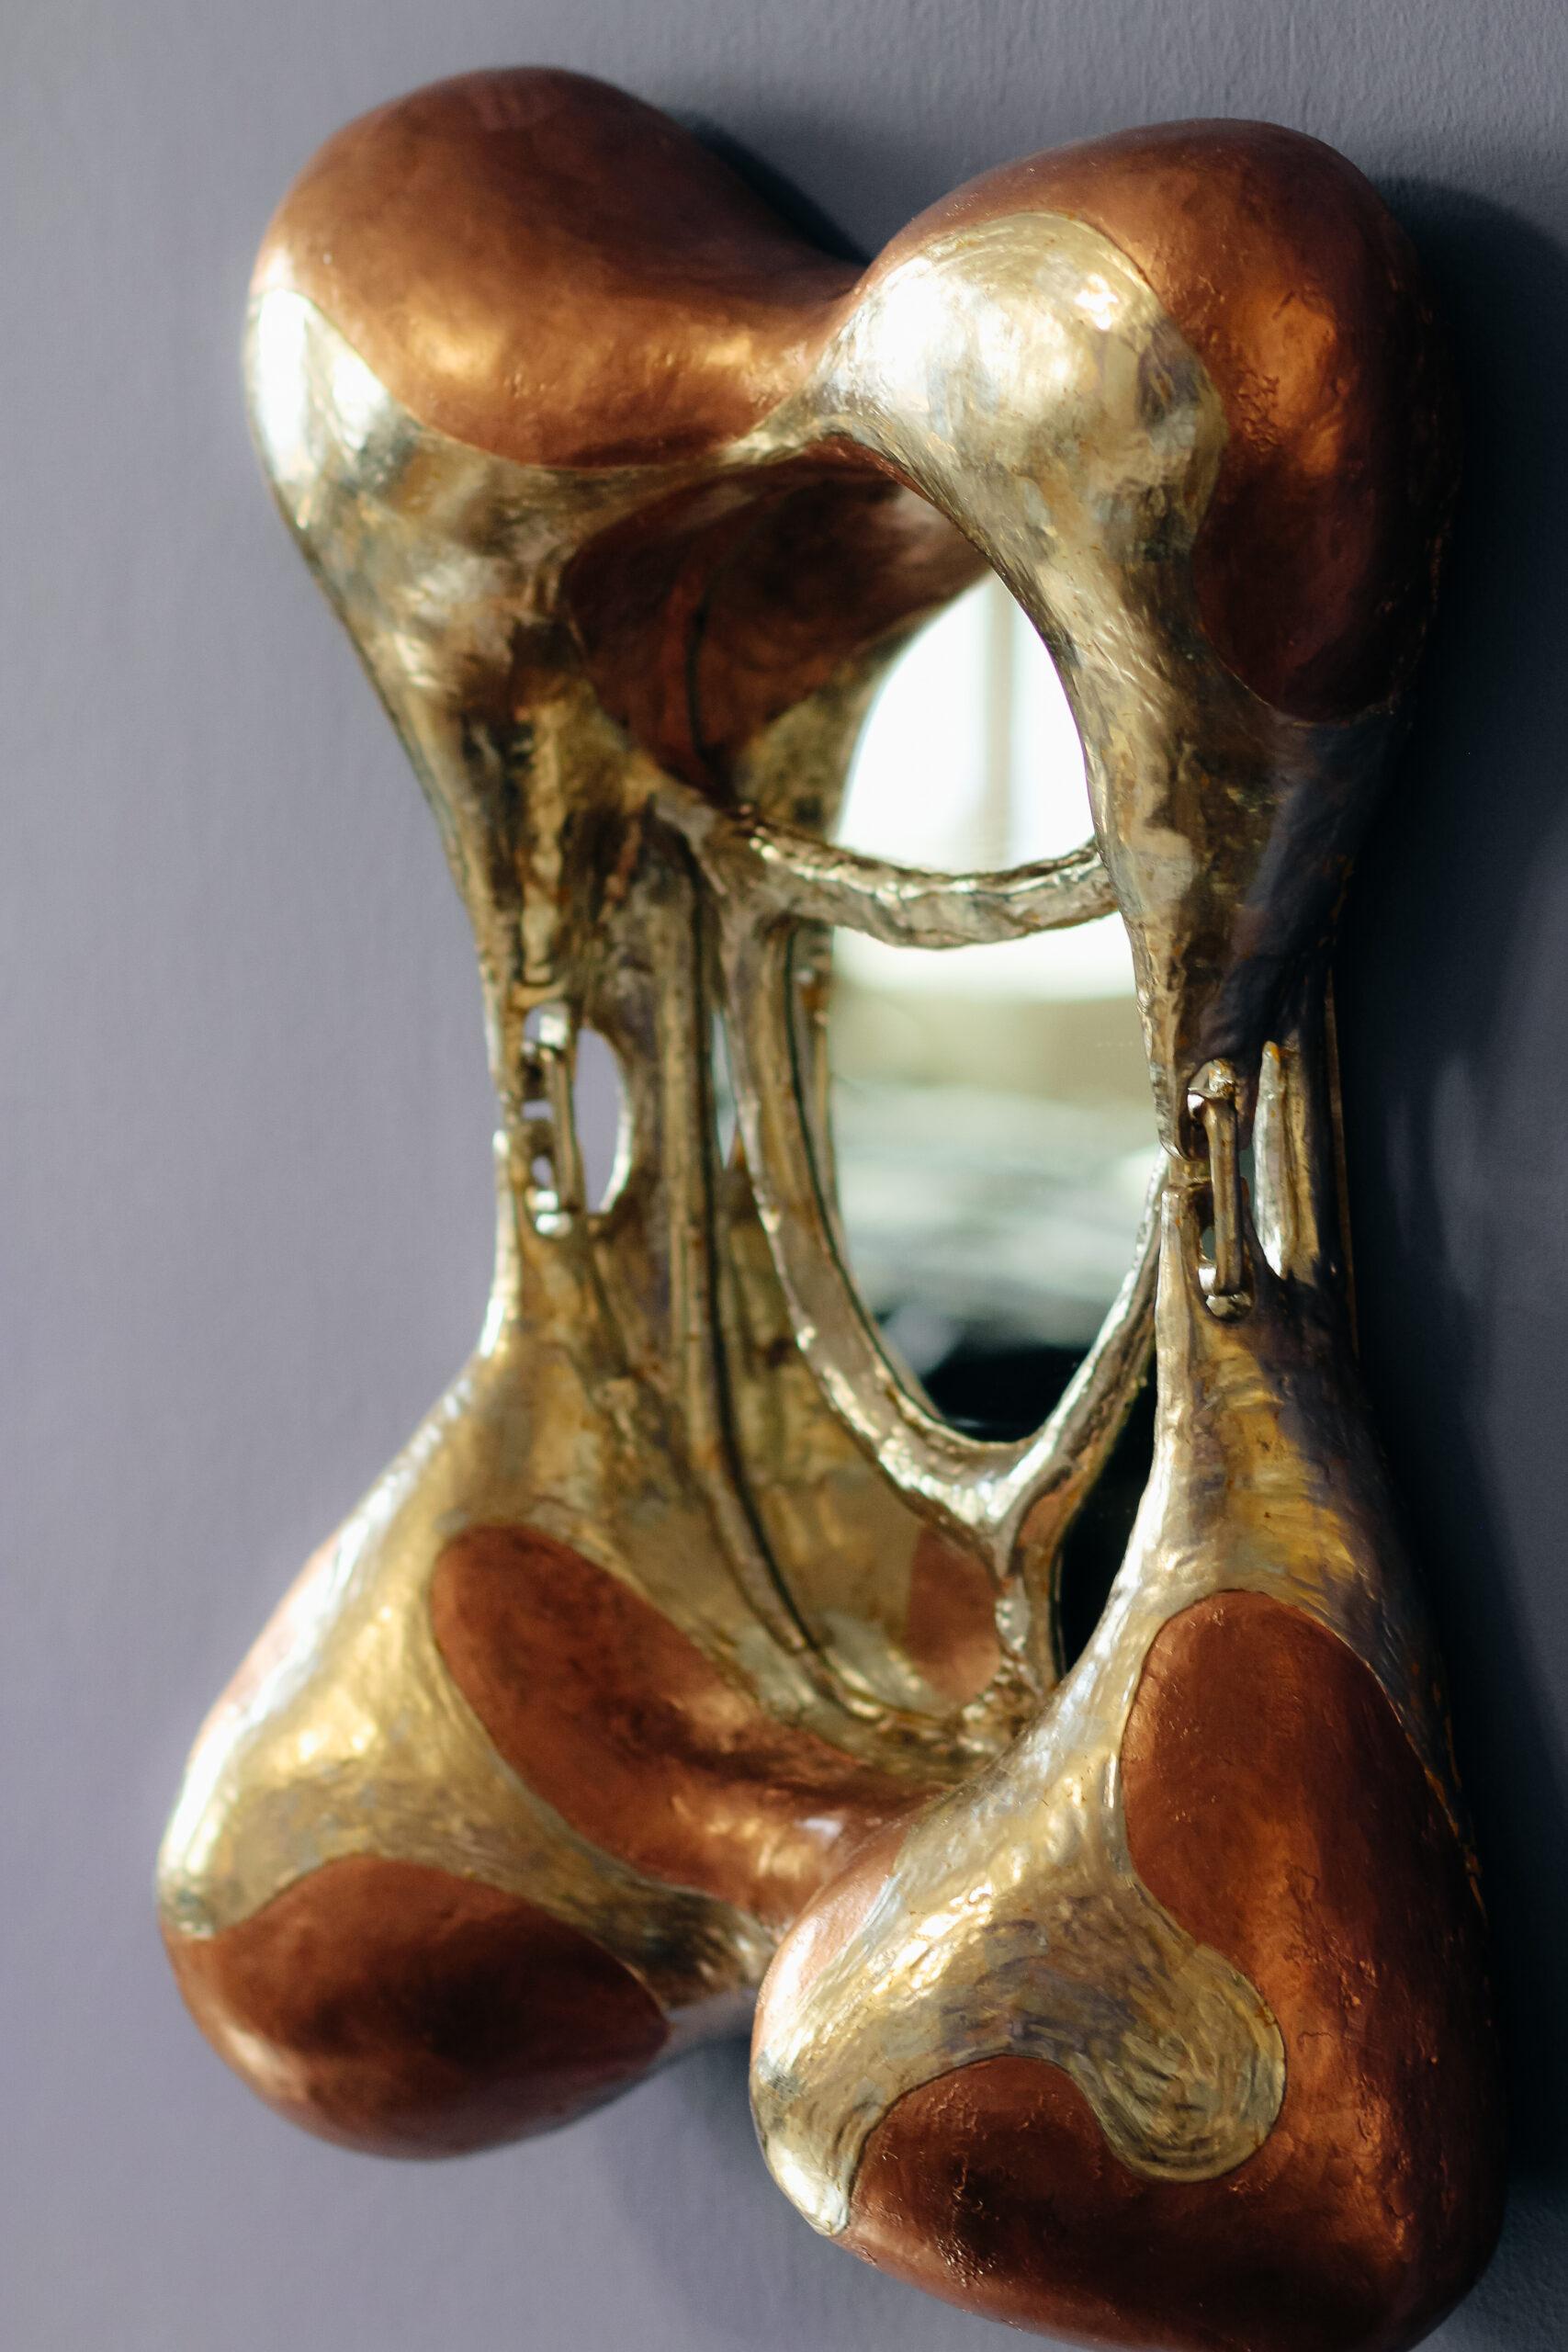 'La duree', gilt wood and sculptural wall mirror by Jacob Hoo